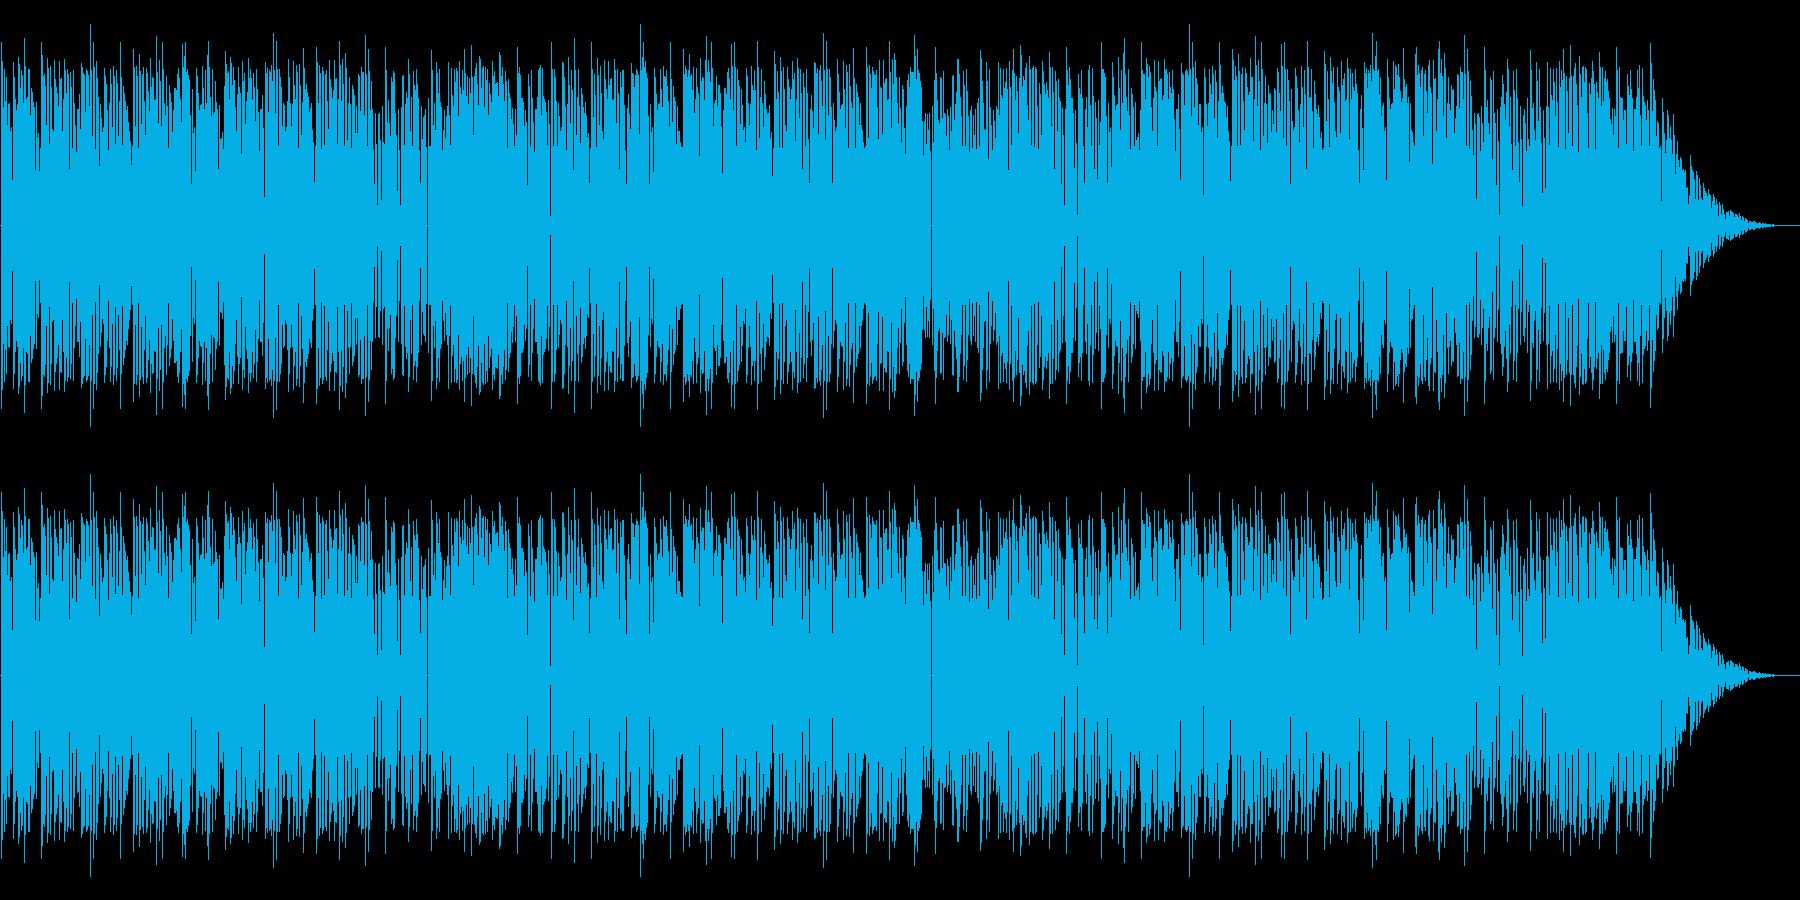 NES レース A04-1(ステージ3)の再生済みの波形